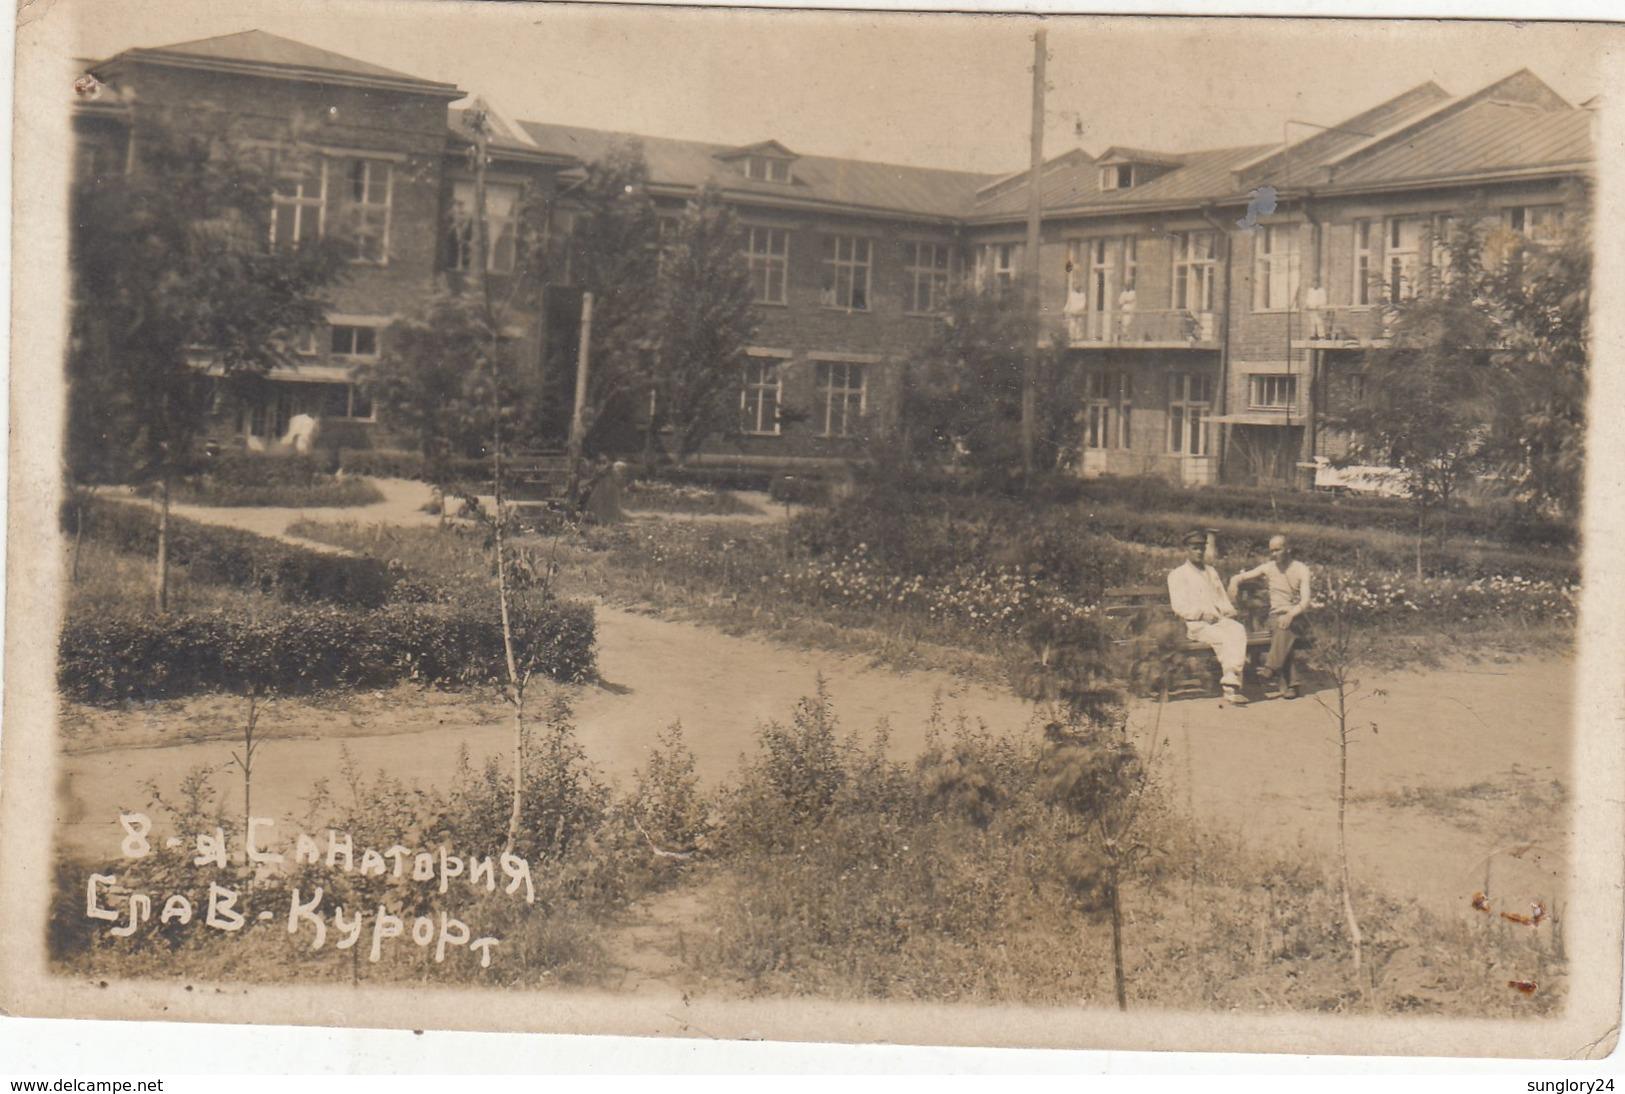 920_001_ukraine-slavyansk-resort-sanatorium.jpg